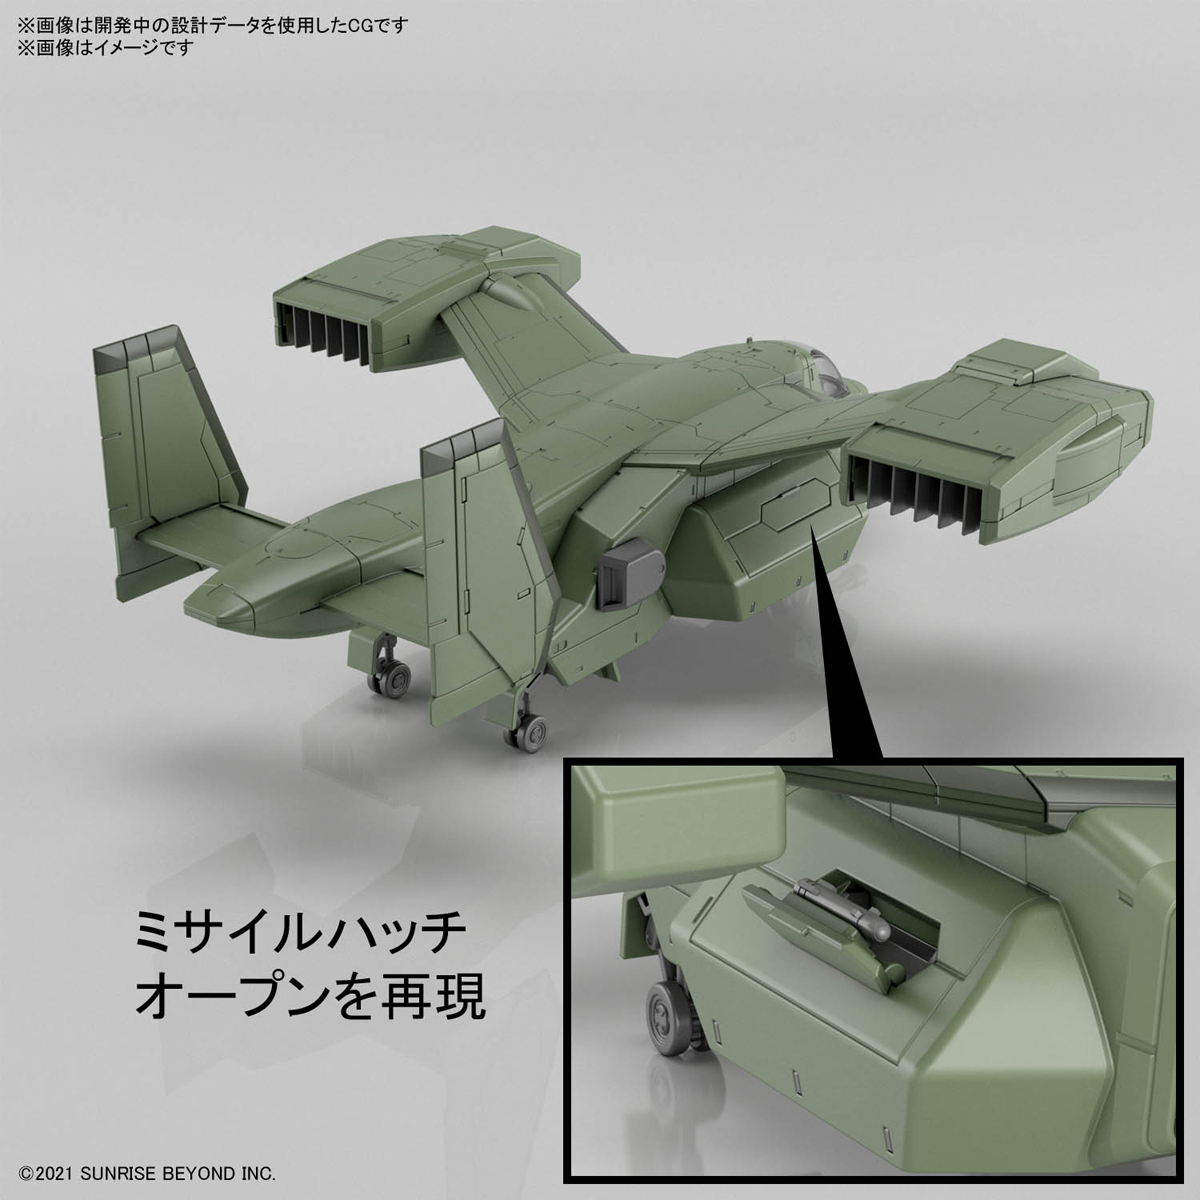 HG 1/72『ブレイディハウンド』境界戦機 プラモデル-008